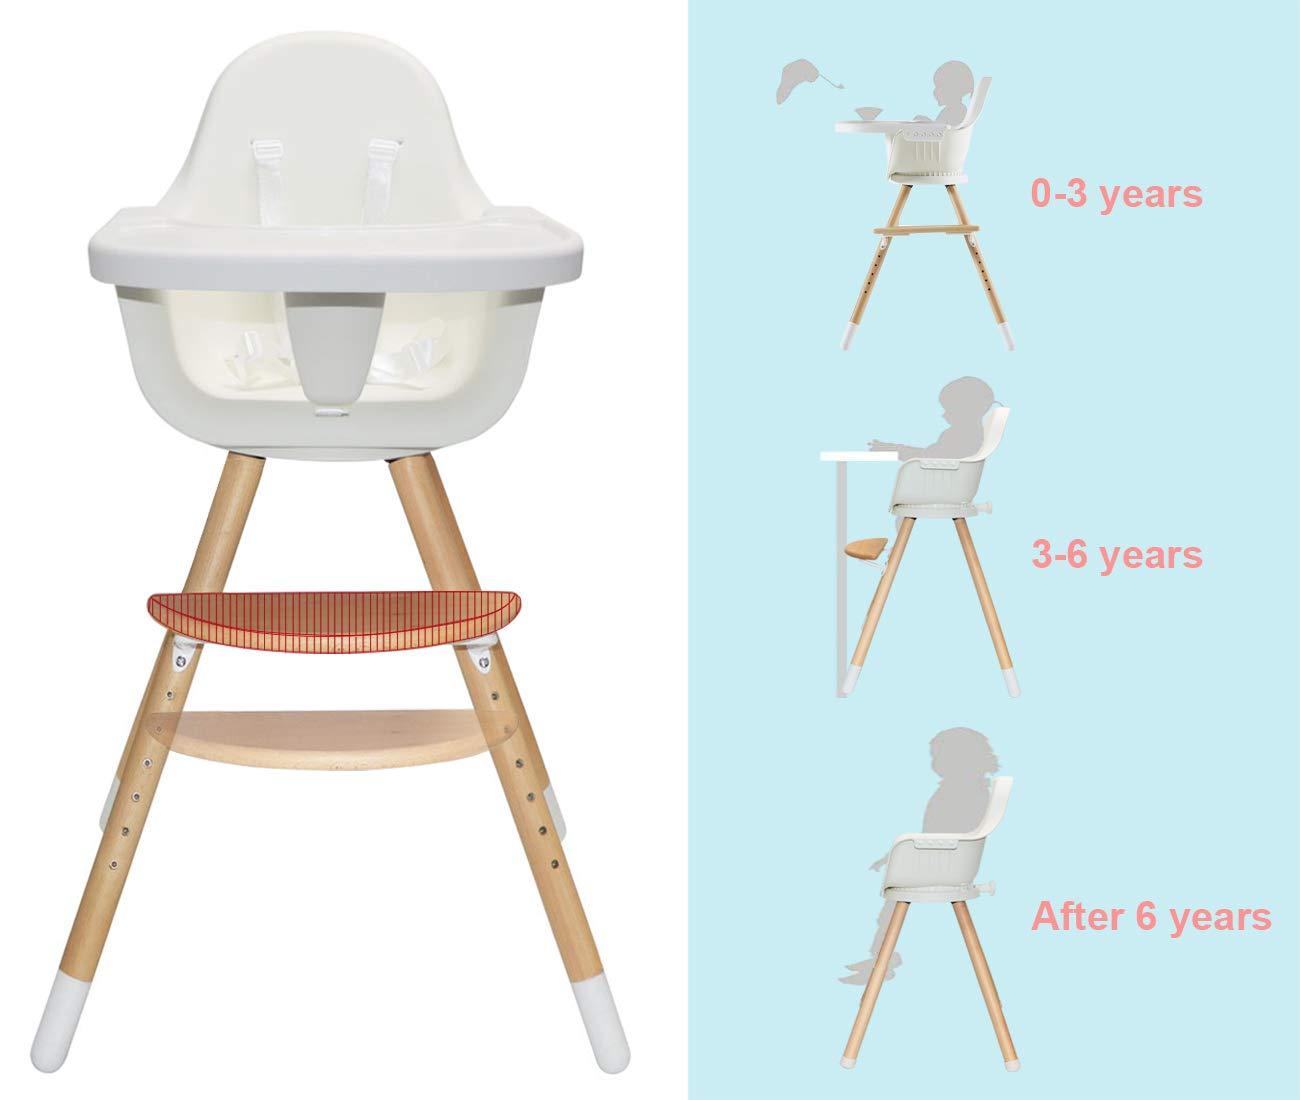 Amazon.com: Asunflower - Silla alta de madera para bebé ...